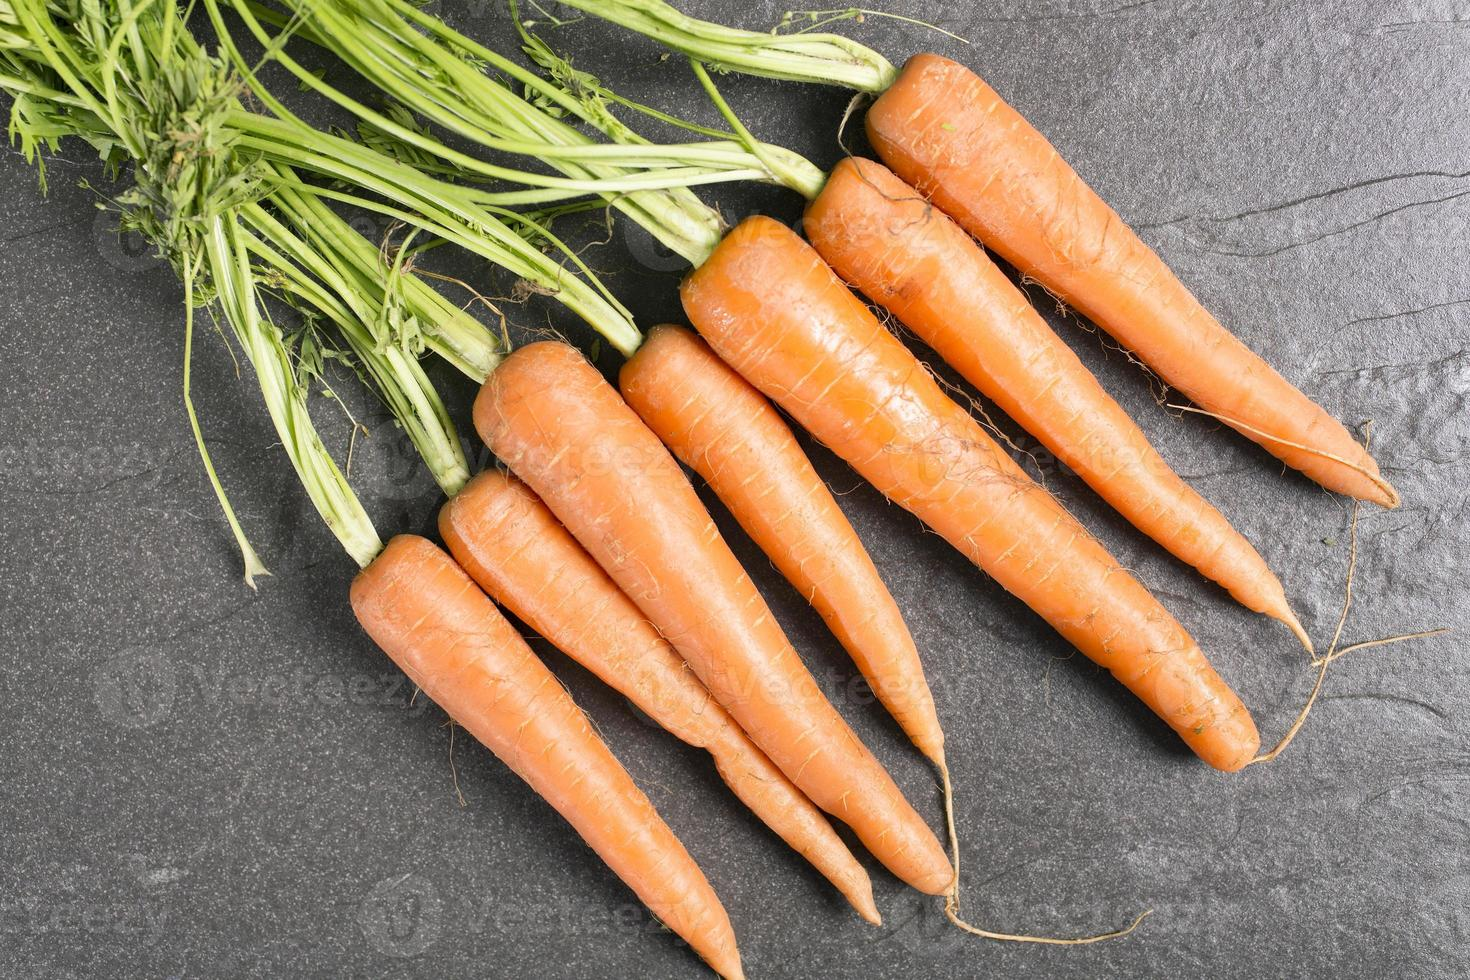 cenouras frescas na ardósia preta foto